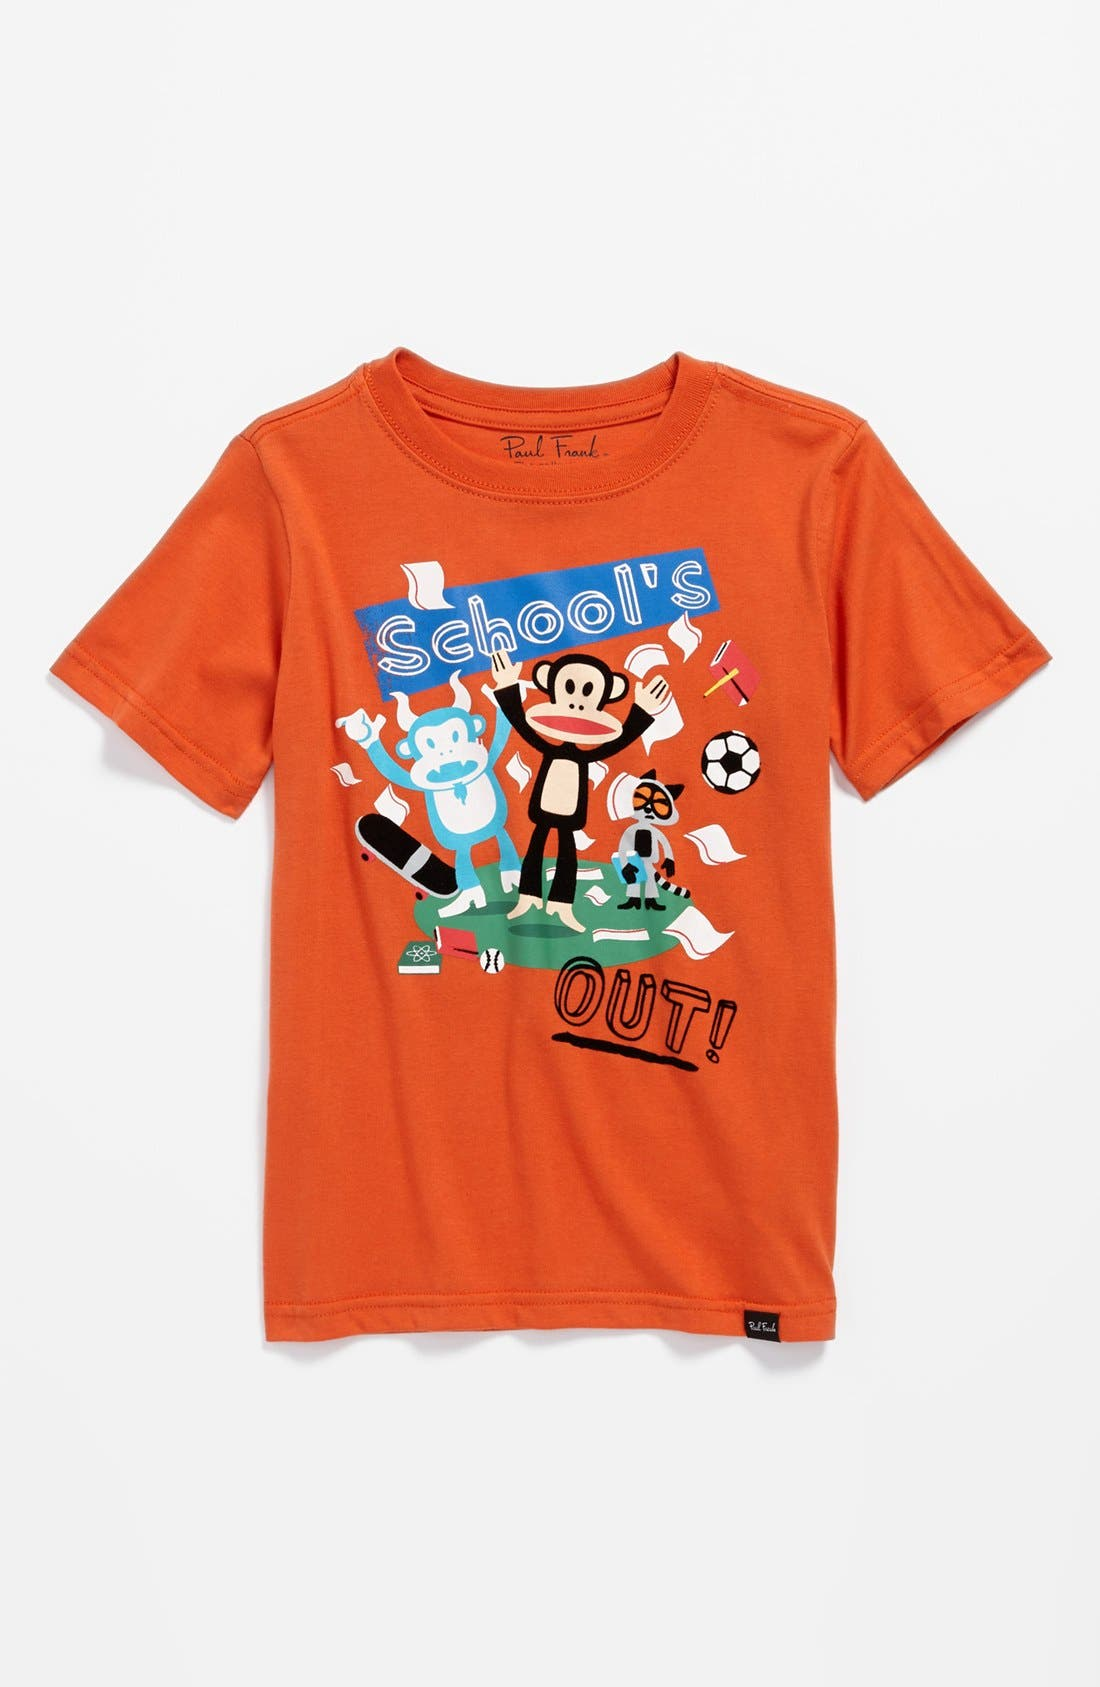 Main Image - Paul Frank 'School's Out' T-Shirt (Little Boys)